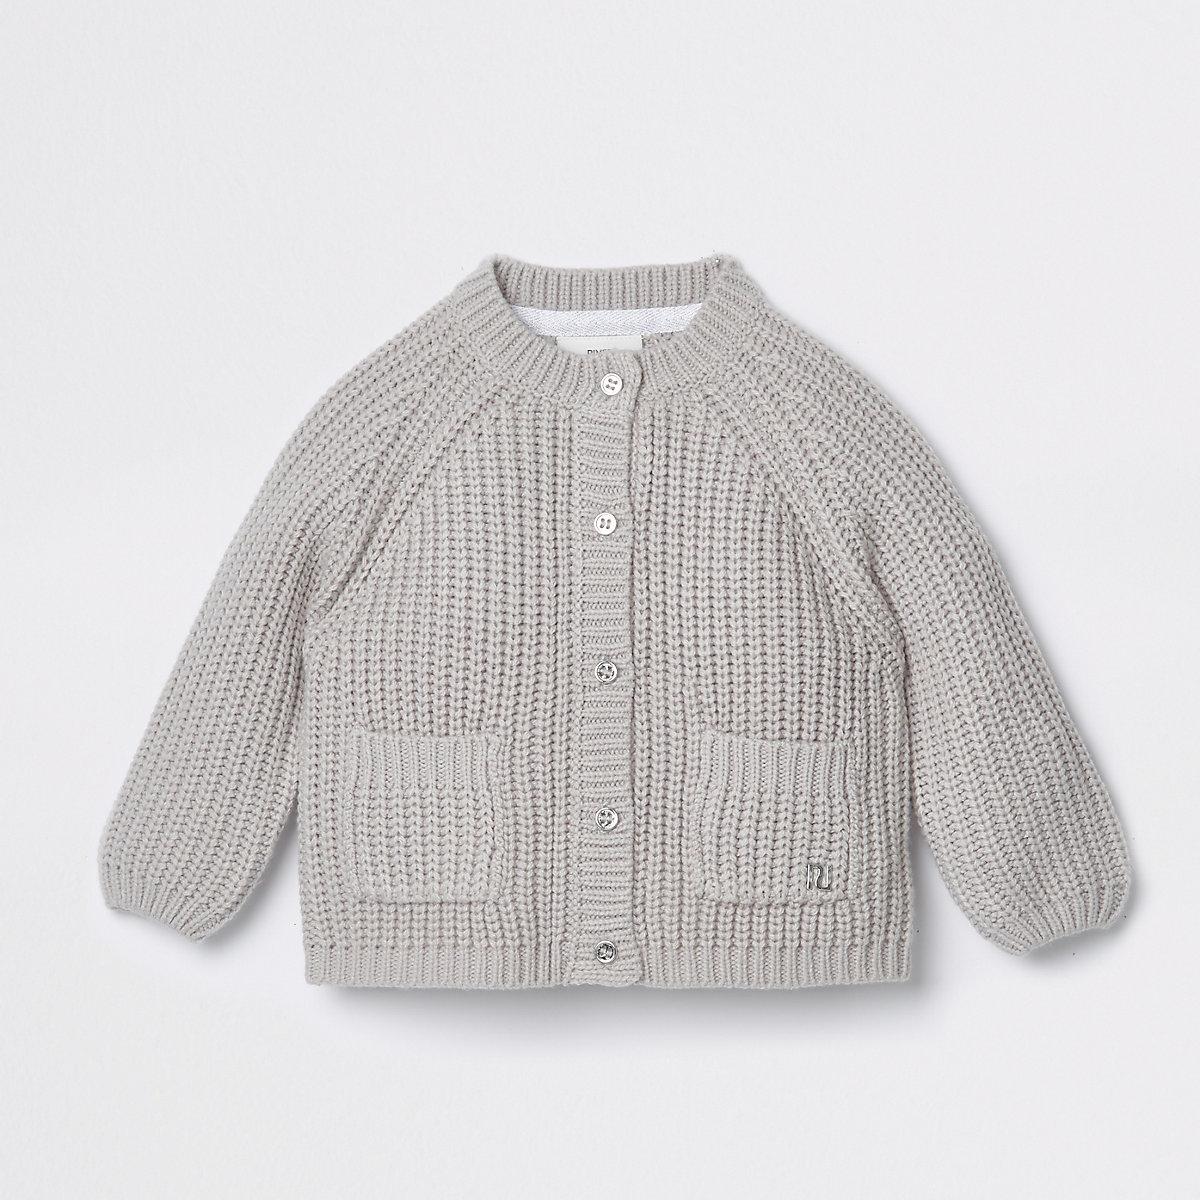 Baby grey chunky knit cardigan